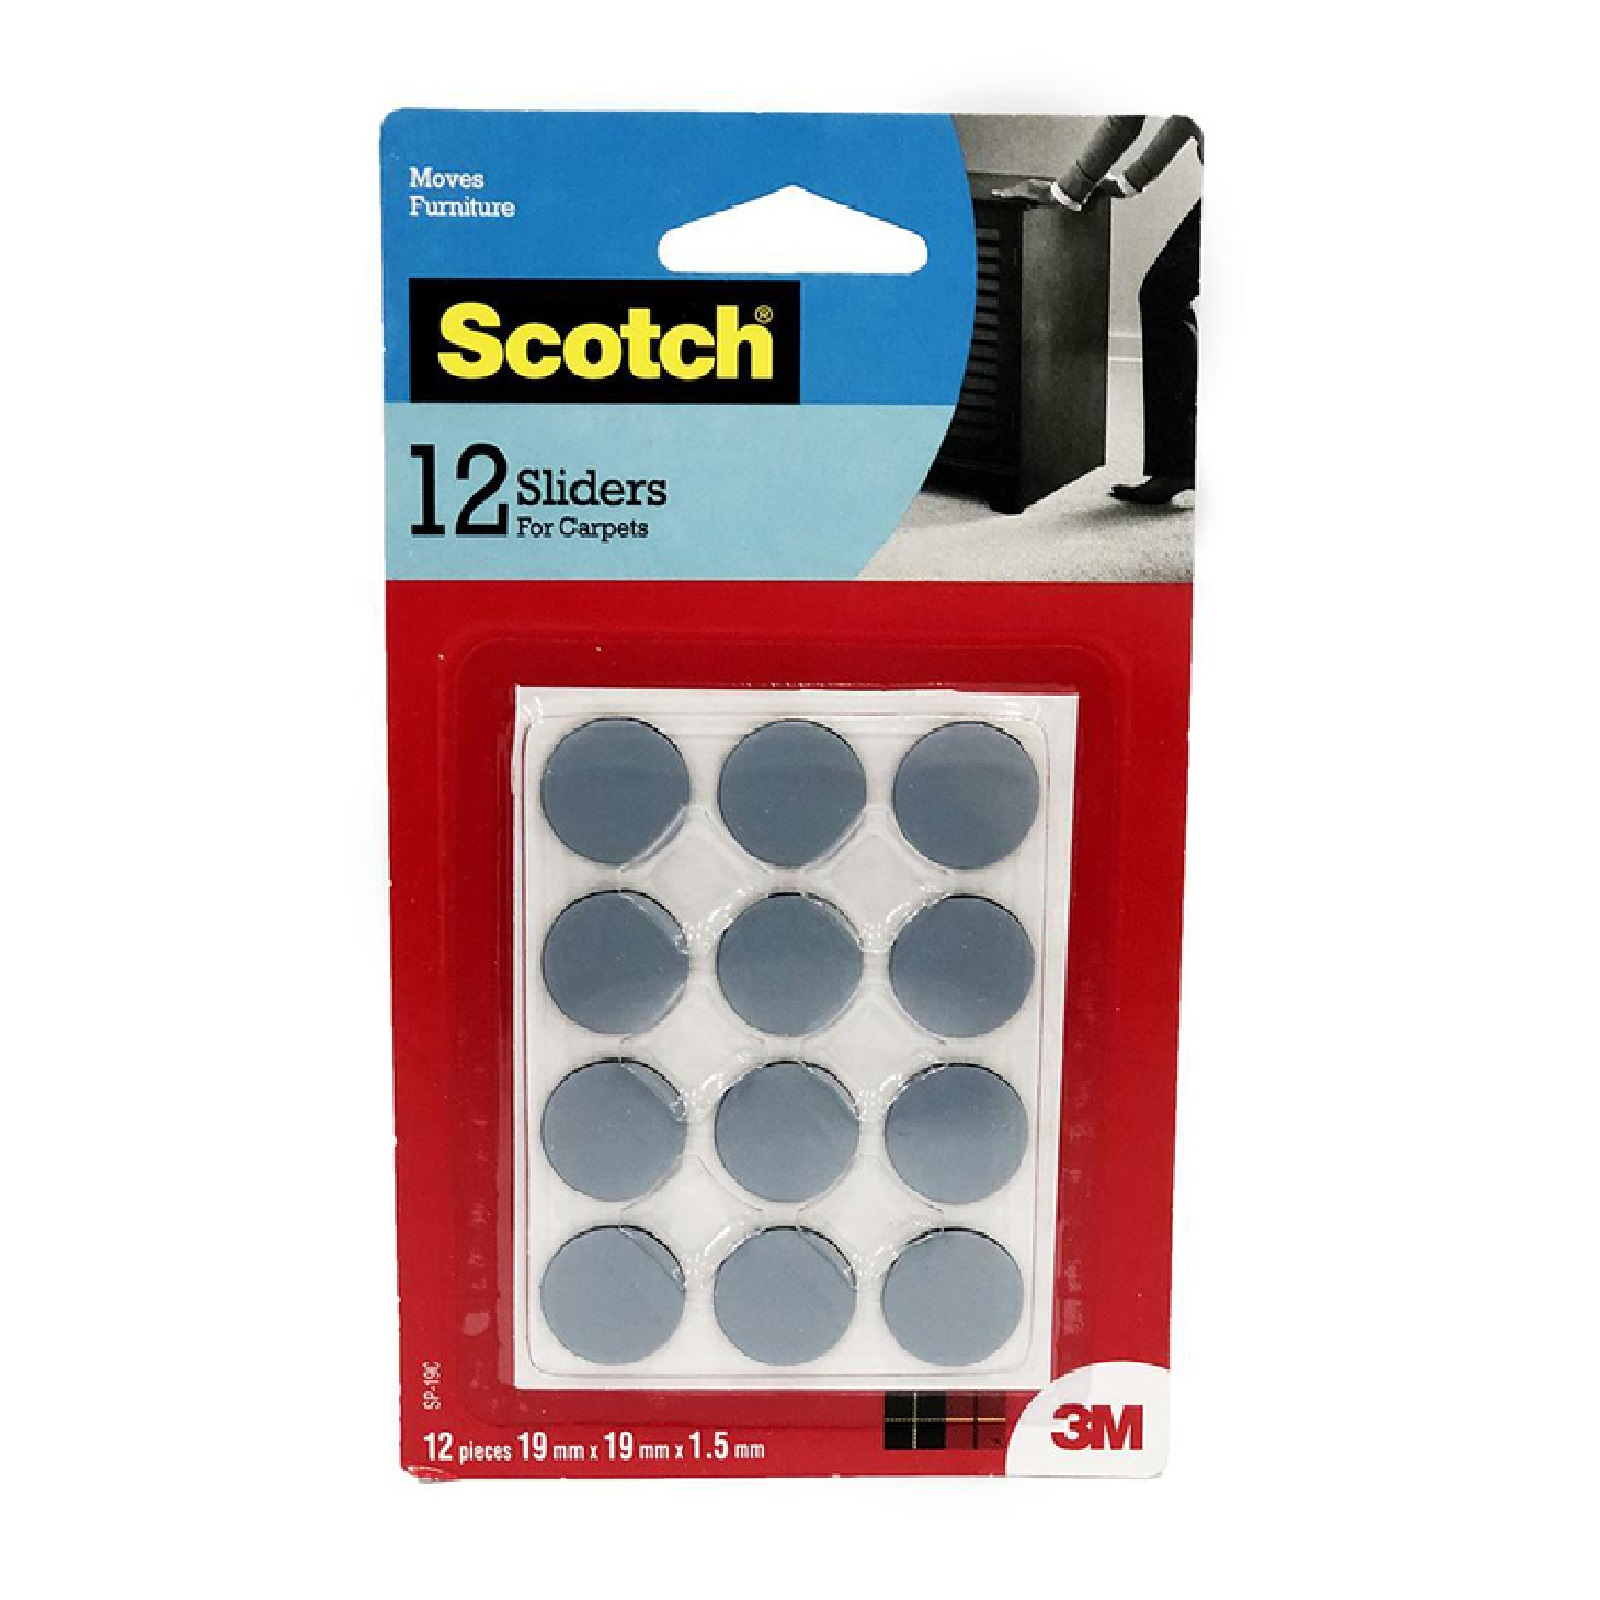 3M Scotch Sliders Circle 19MM 12PC/Pack